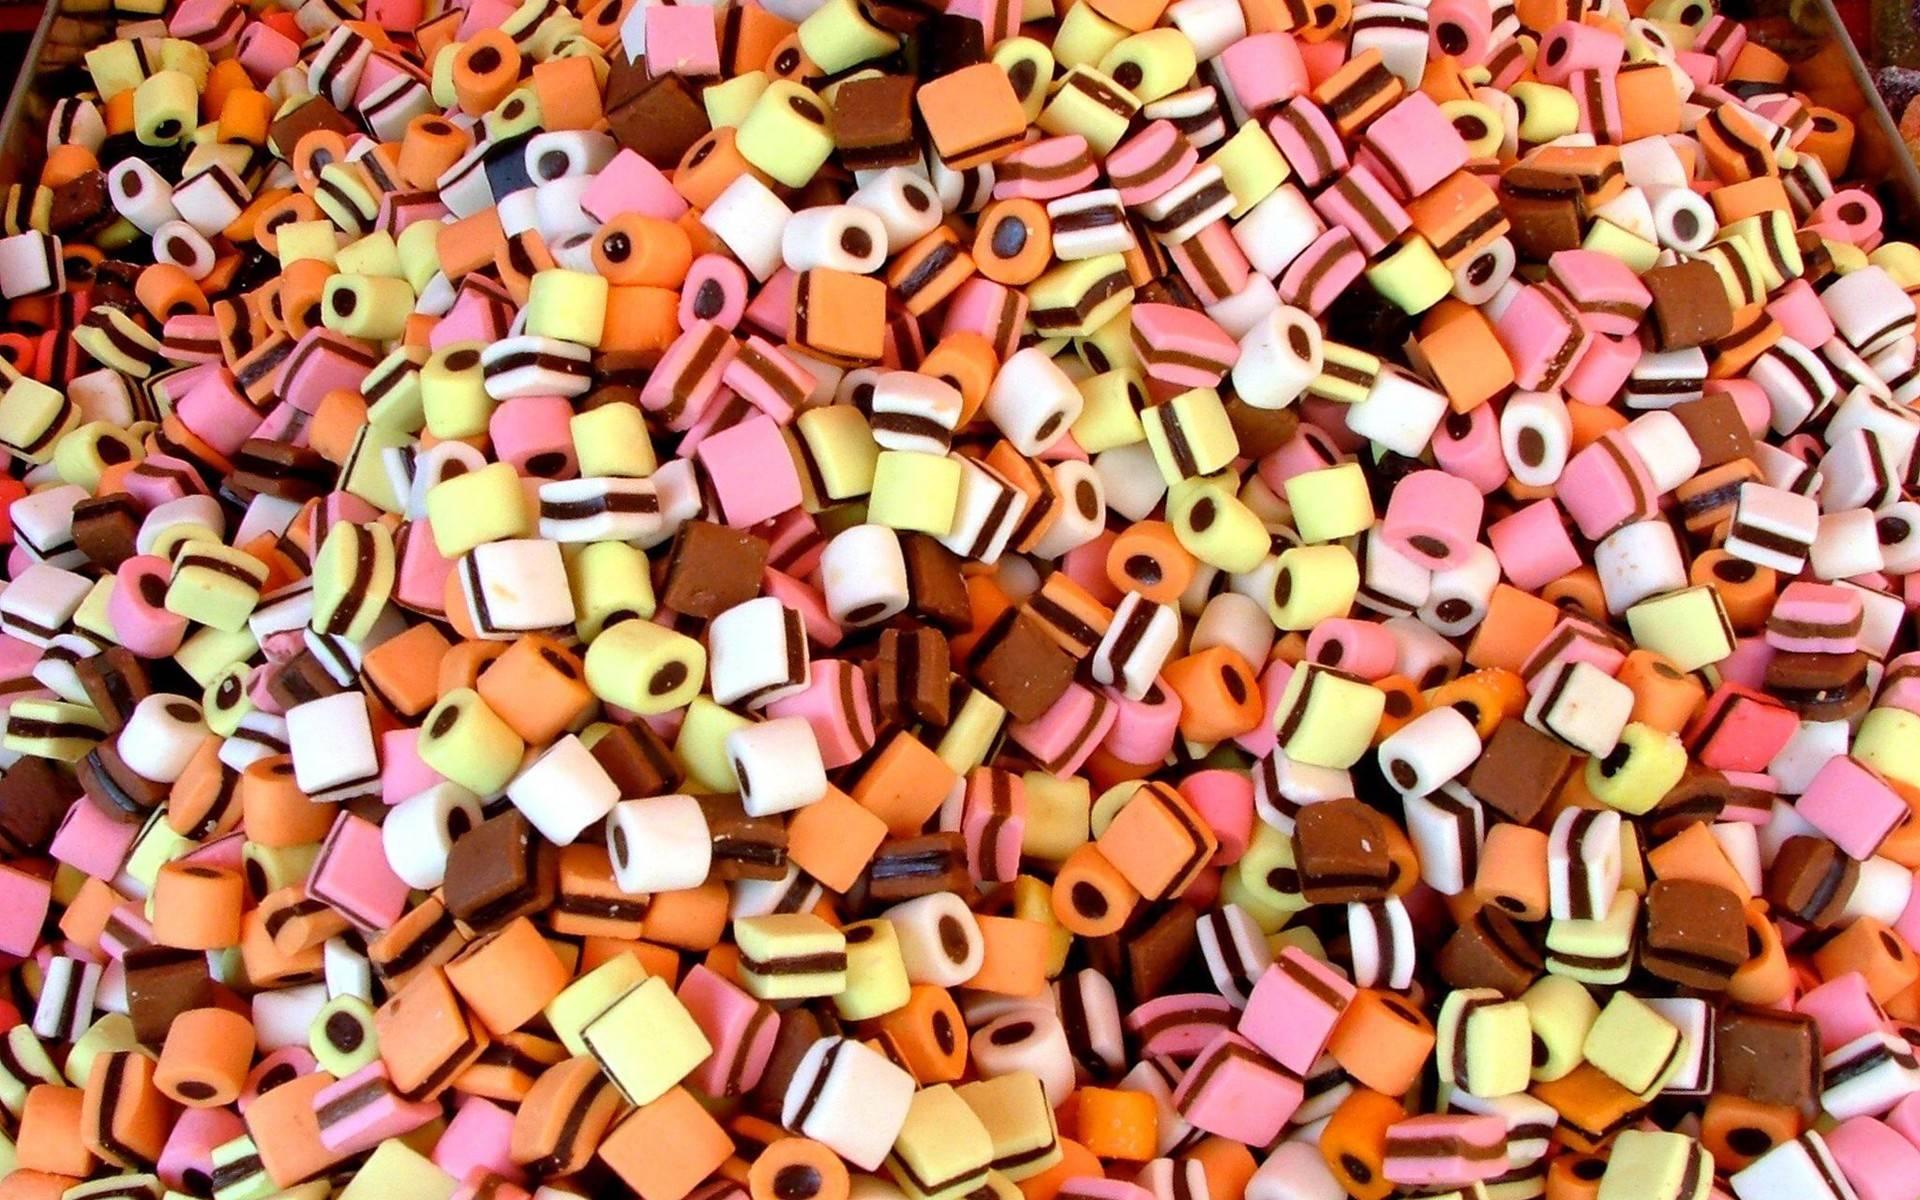 Candy Wallpaper Wallpaper of Candy 1920x1200